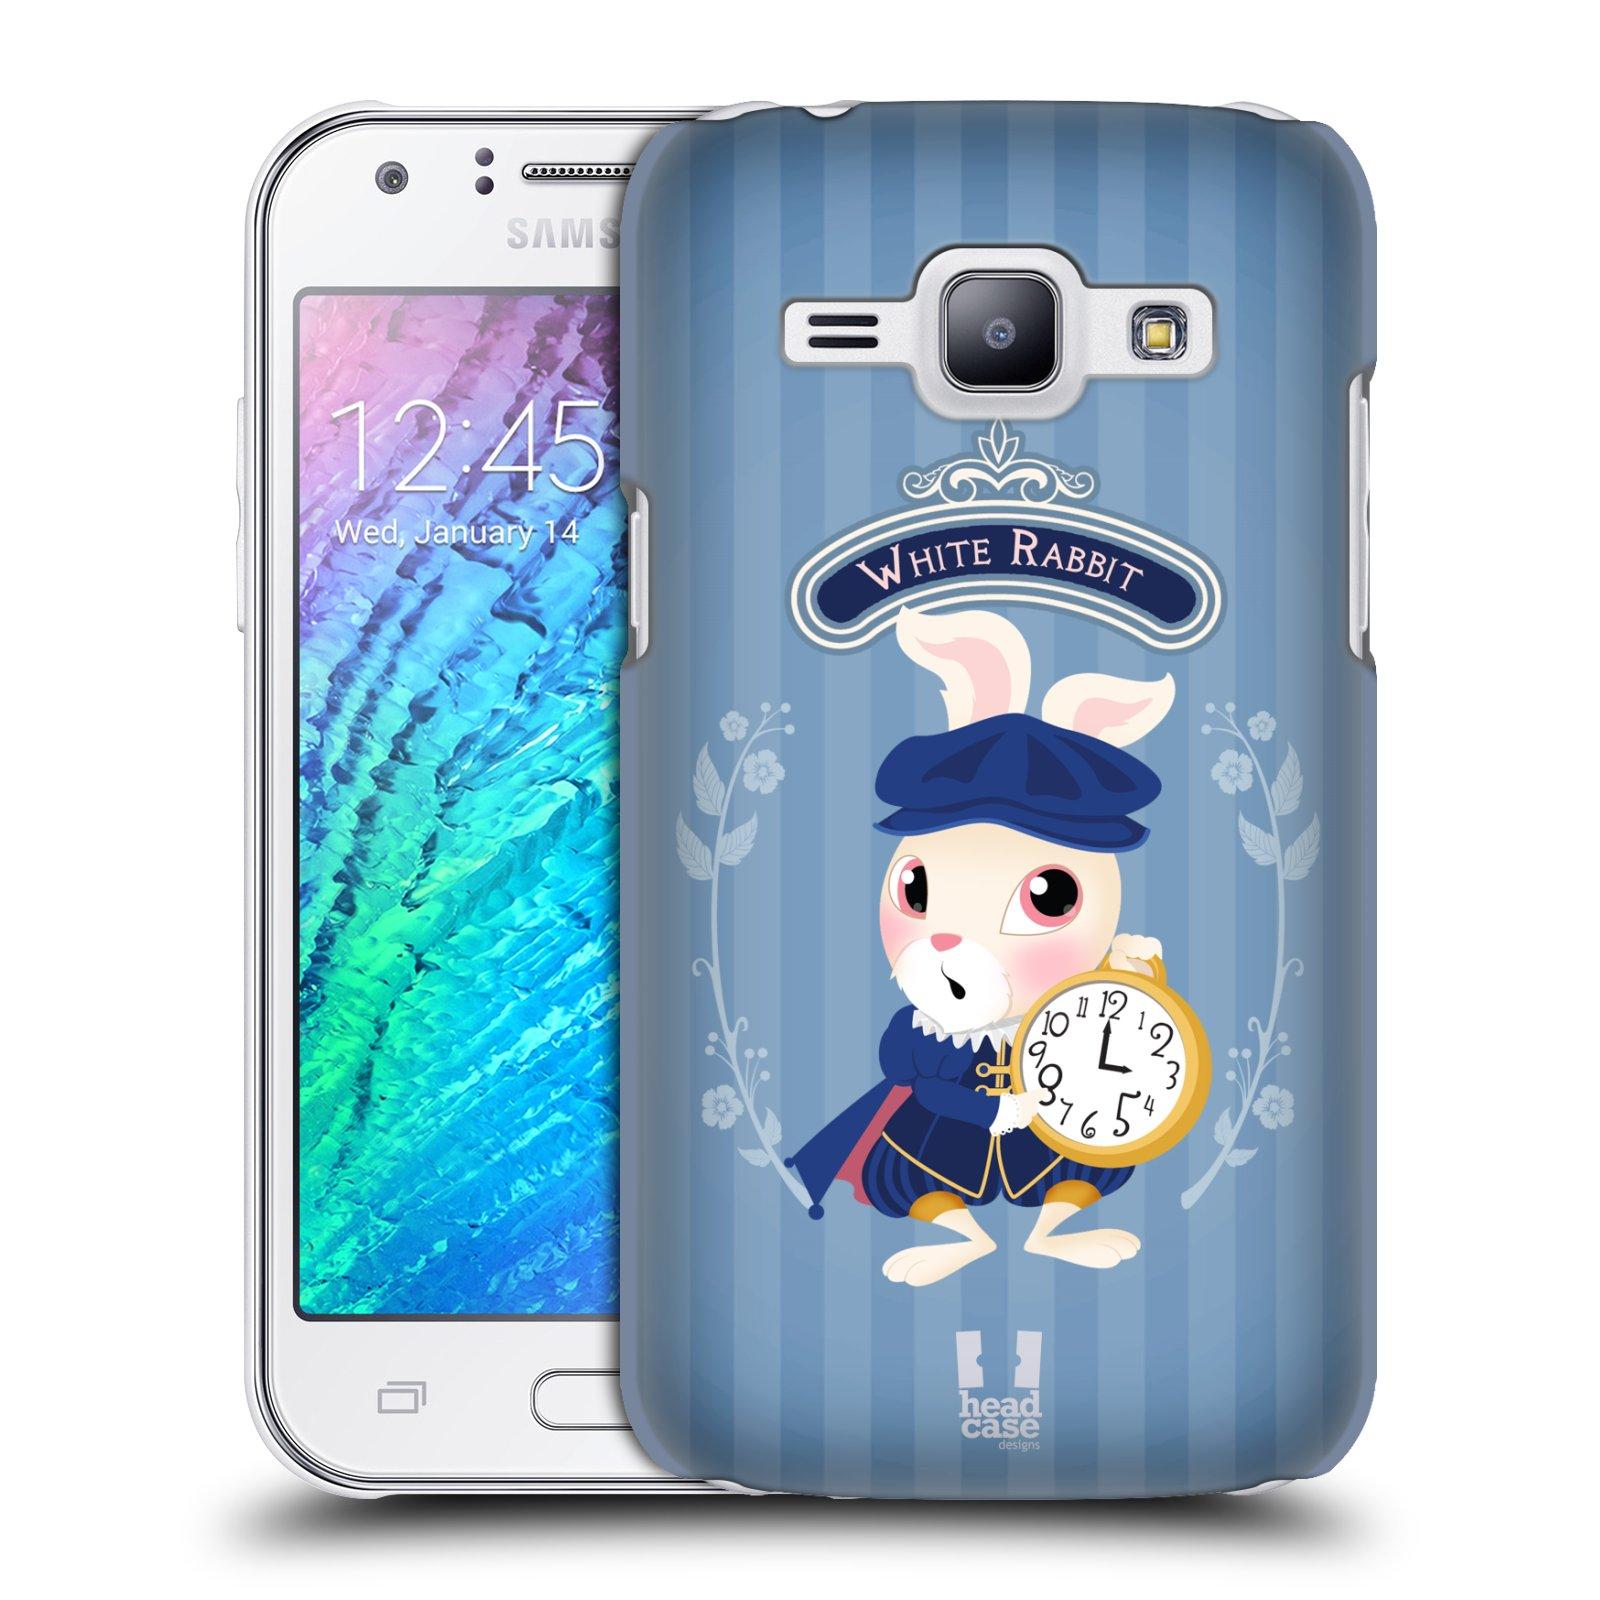 HEAD CASE plastový obal na mobil SAMSUNG Galaxy J1, J100 vzor Alenka v říši divů králíček